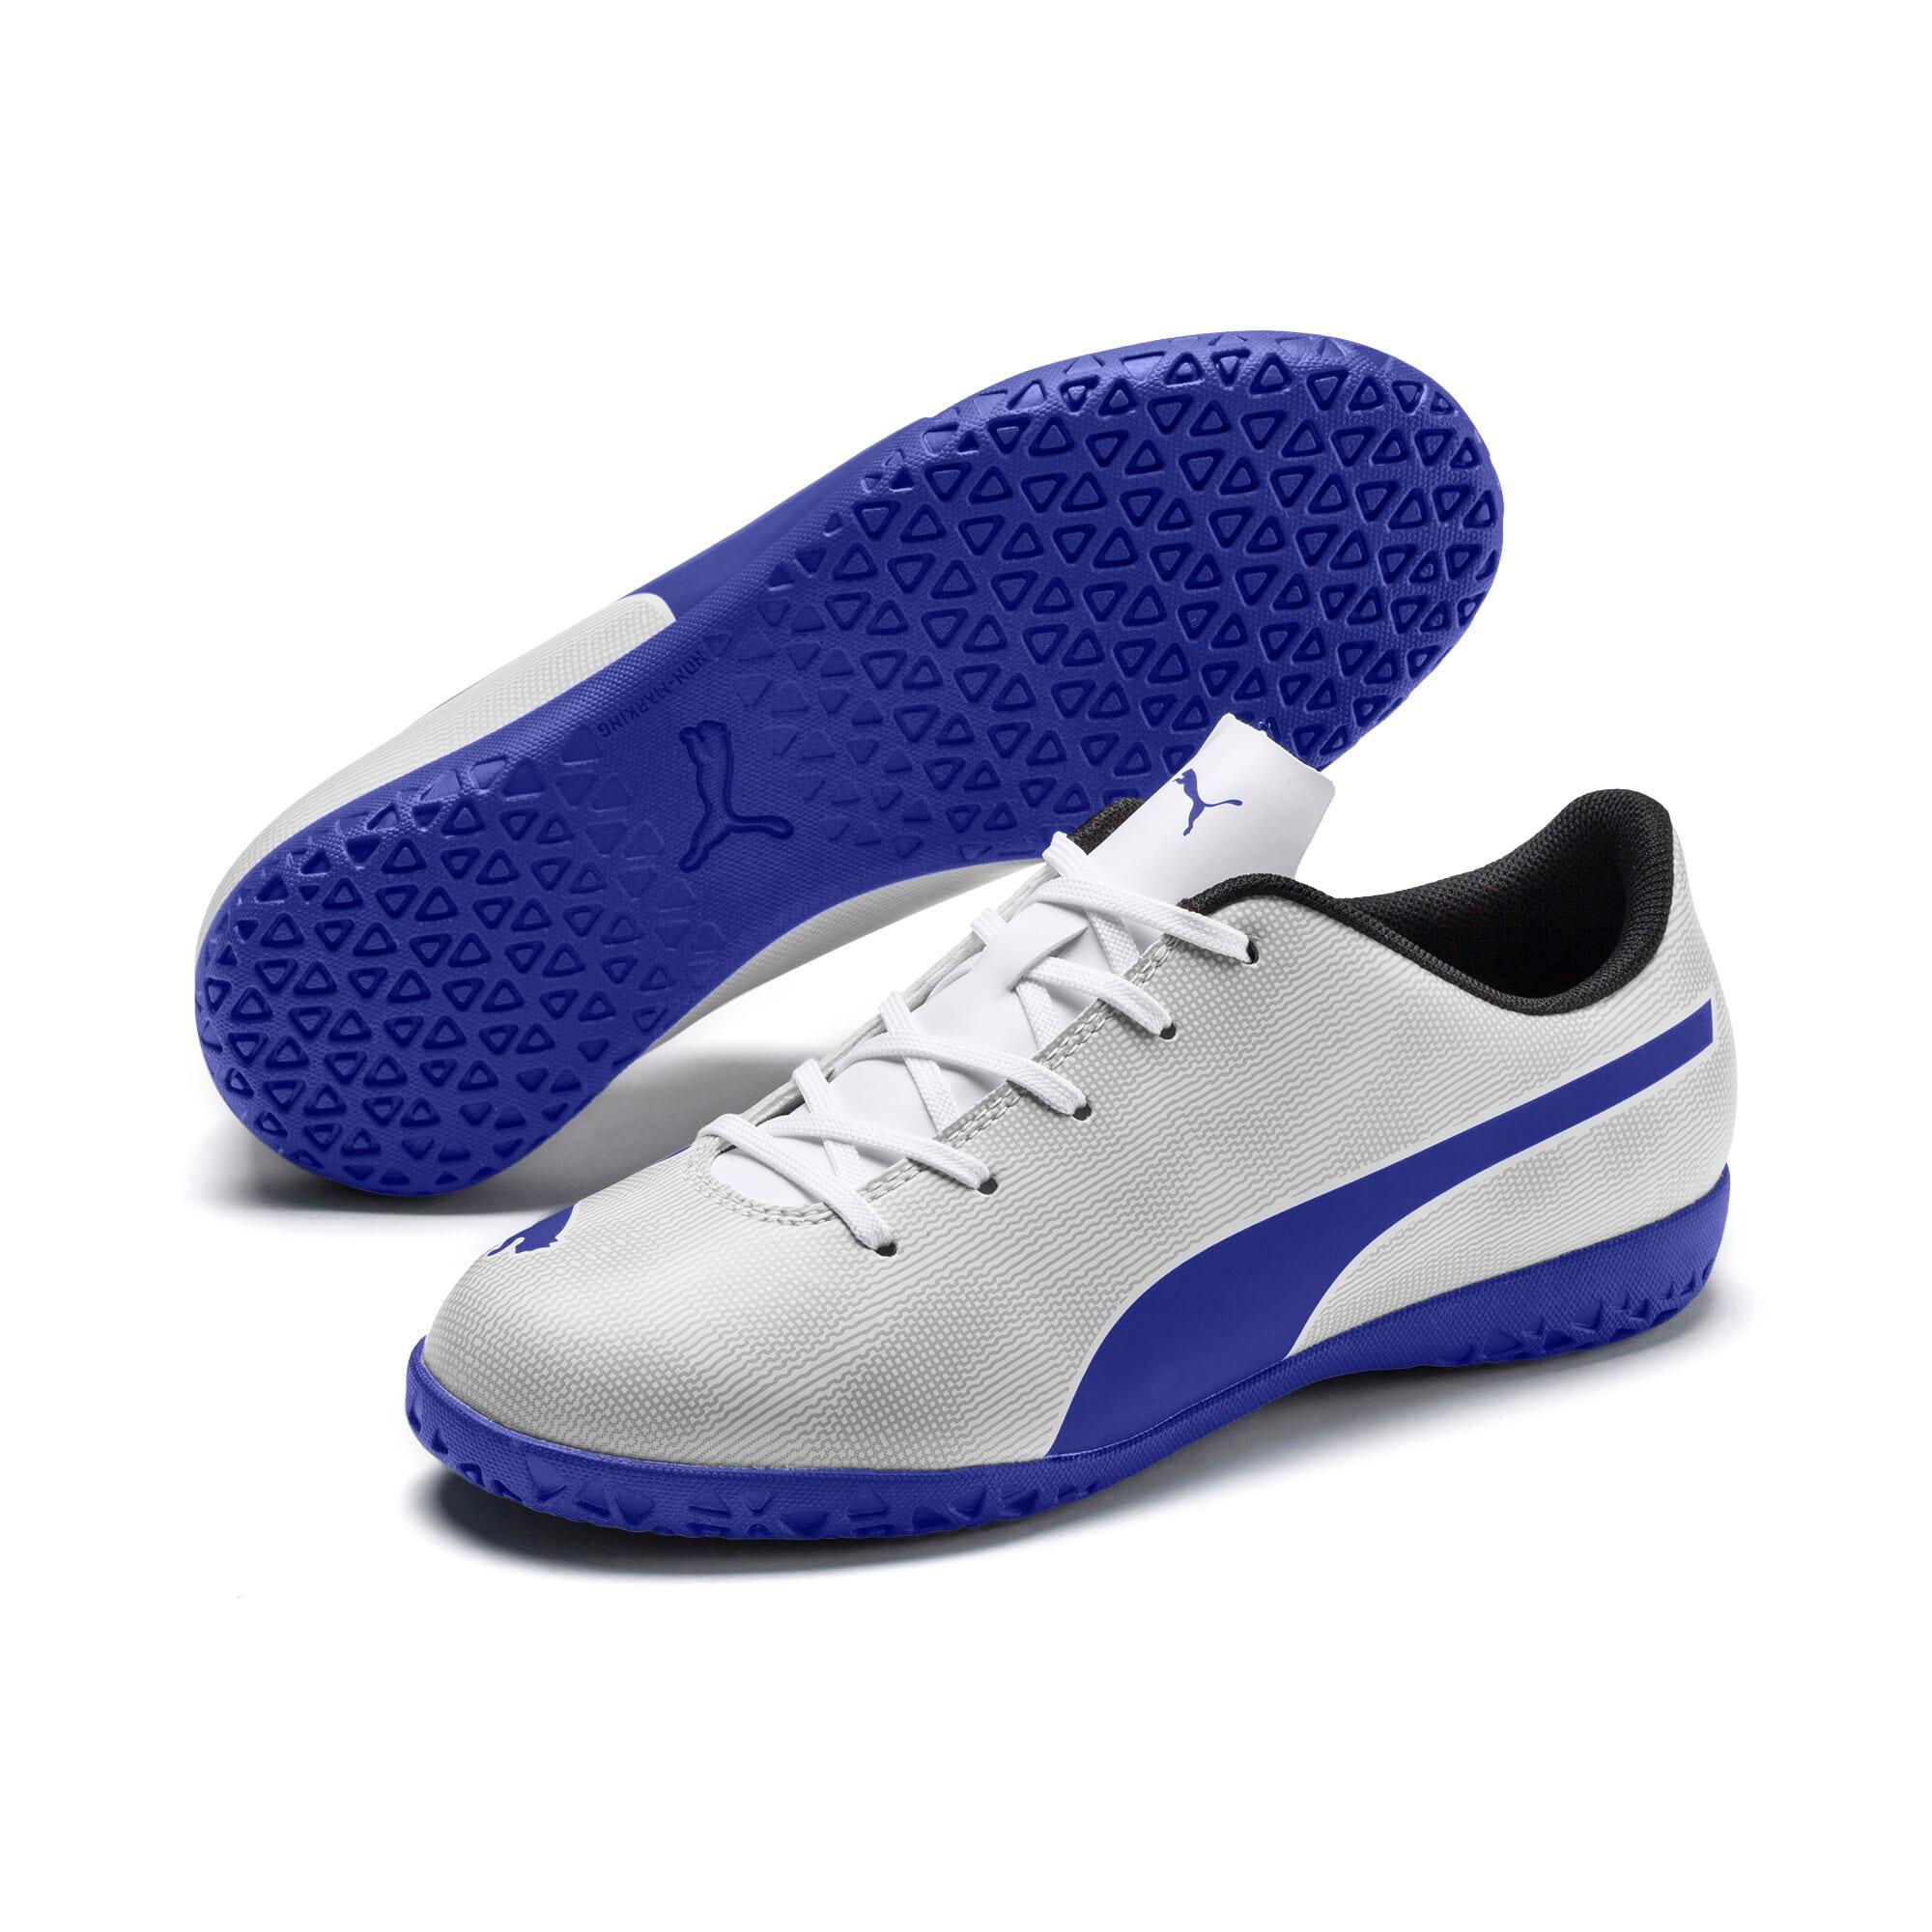 Thumbnail 2 of Rapido IT Boy's Soccer Shoes JR, White-Royal Blue-Light Gray, medium